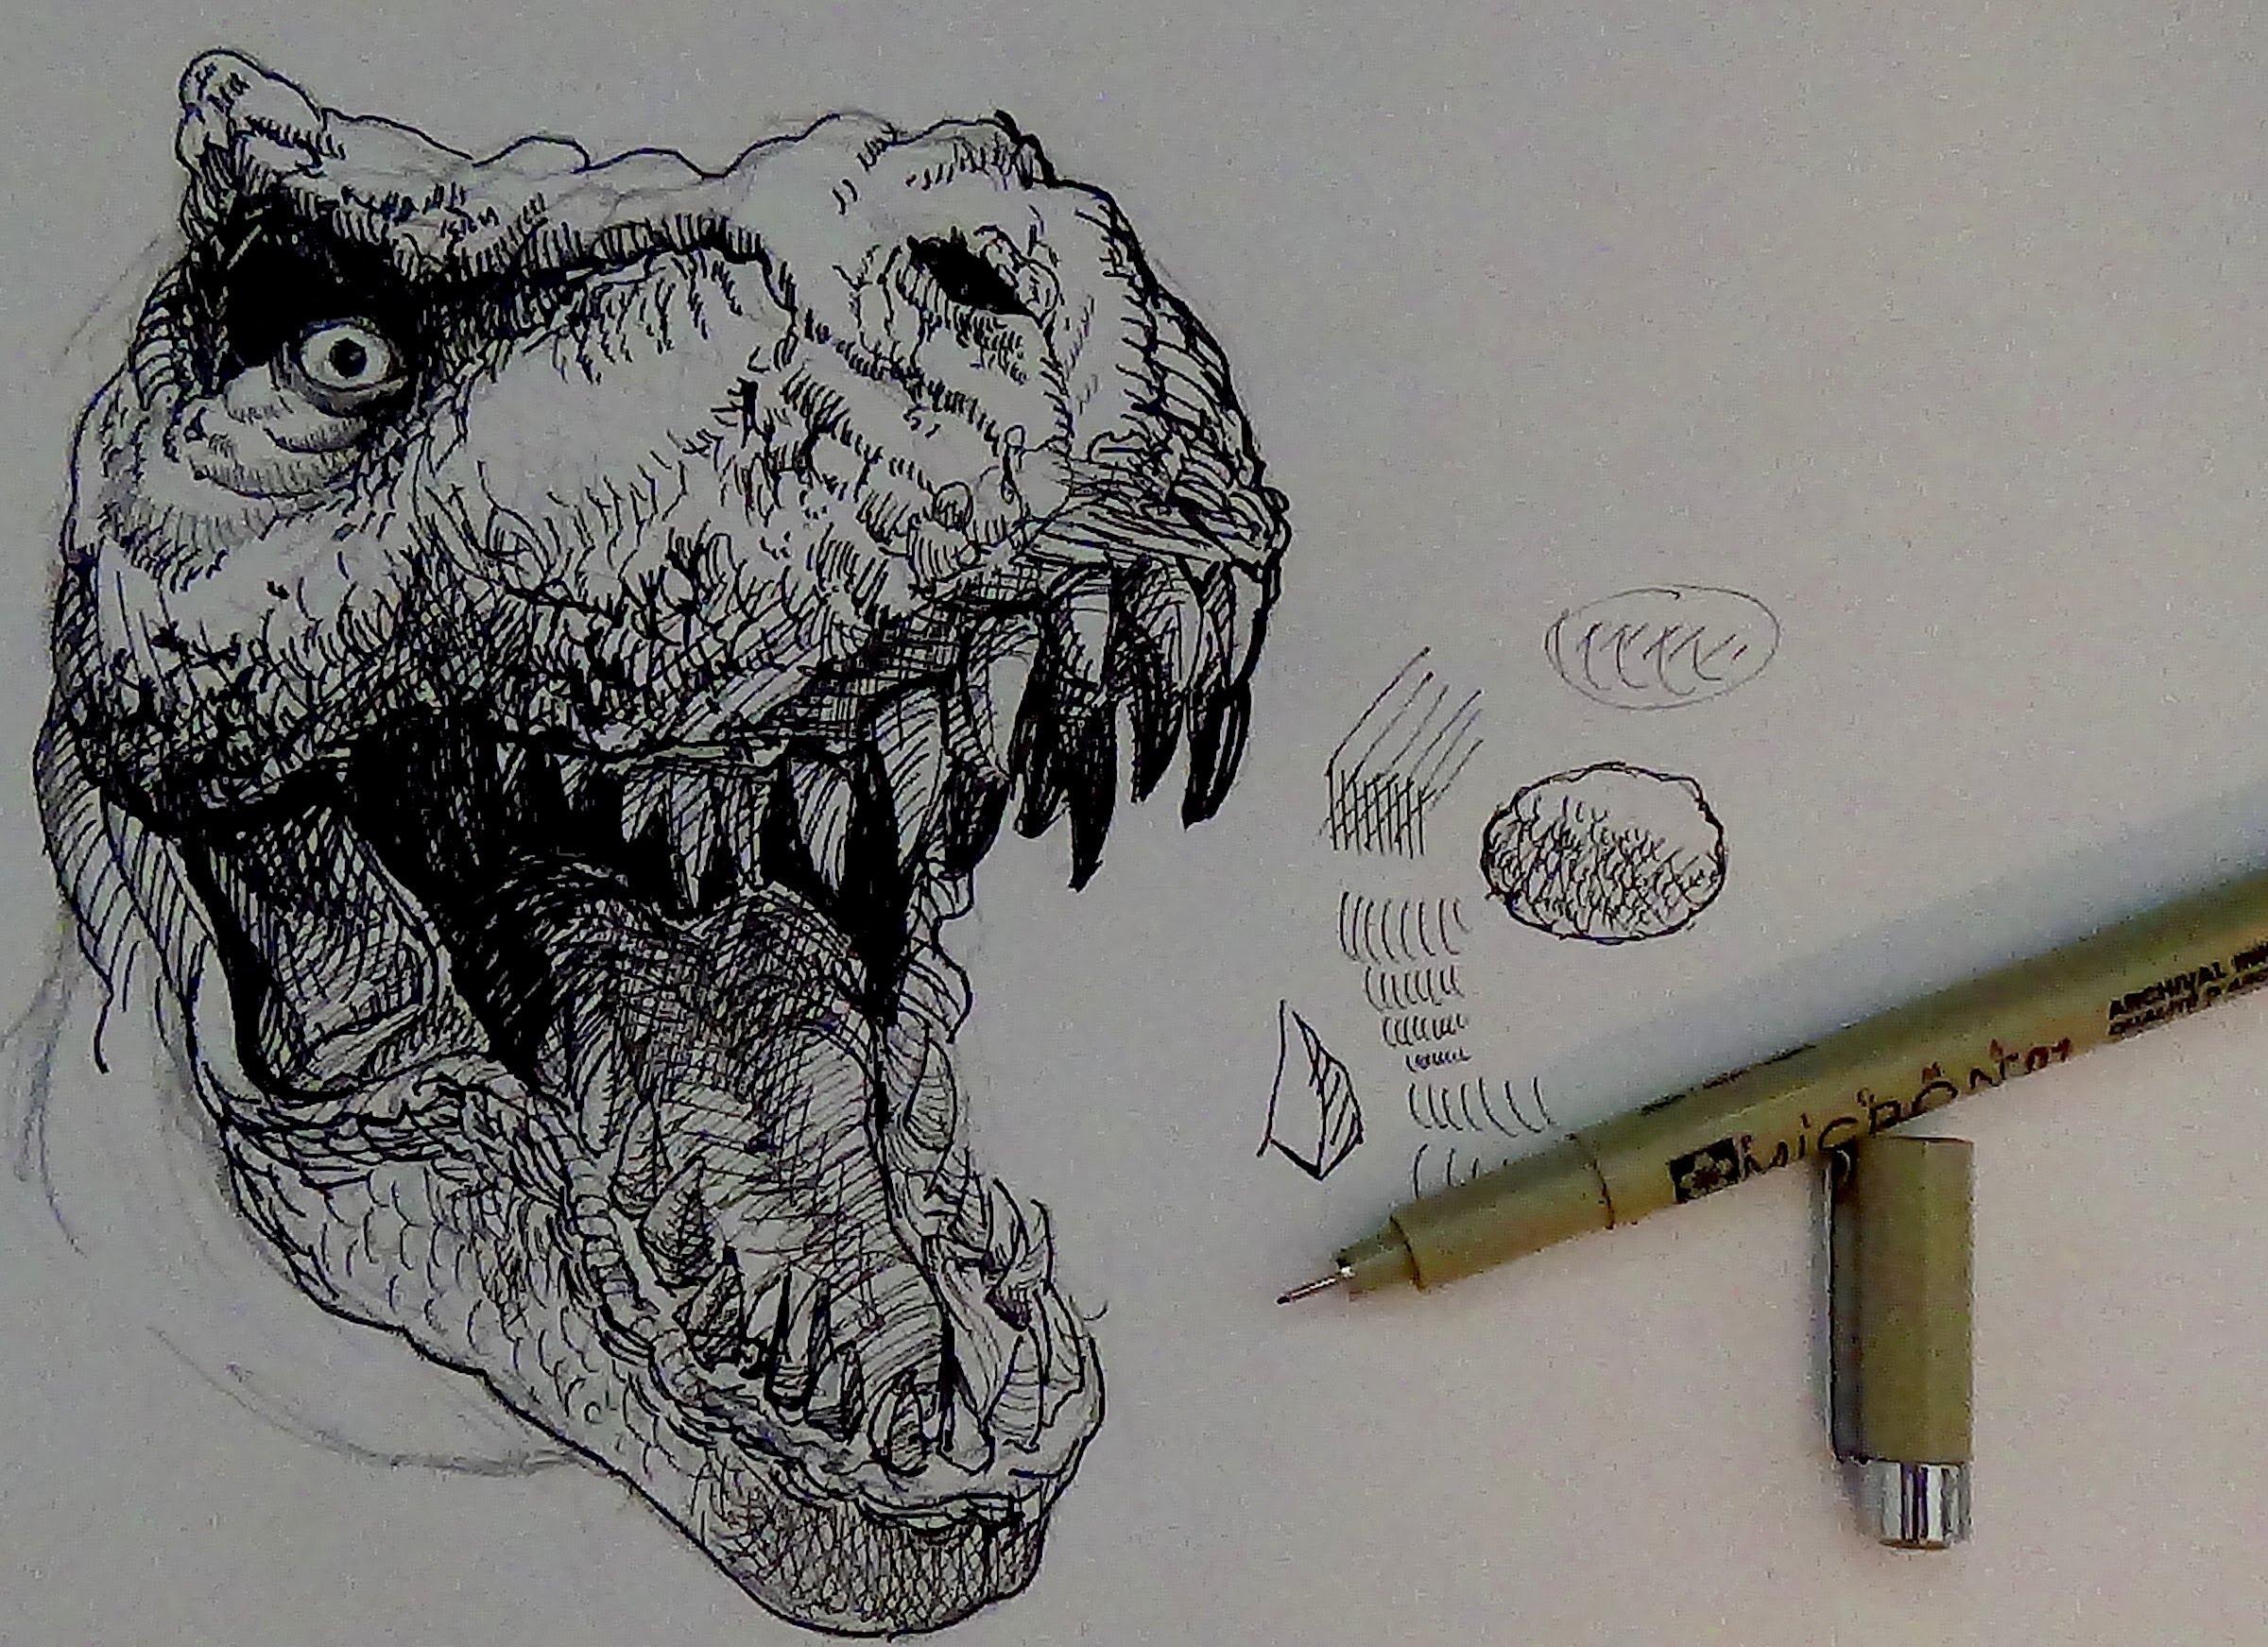 Drawn smoke seriousness Tutorials Dinosaur rex YouTube How